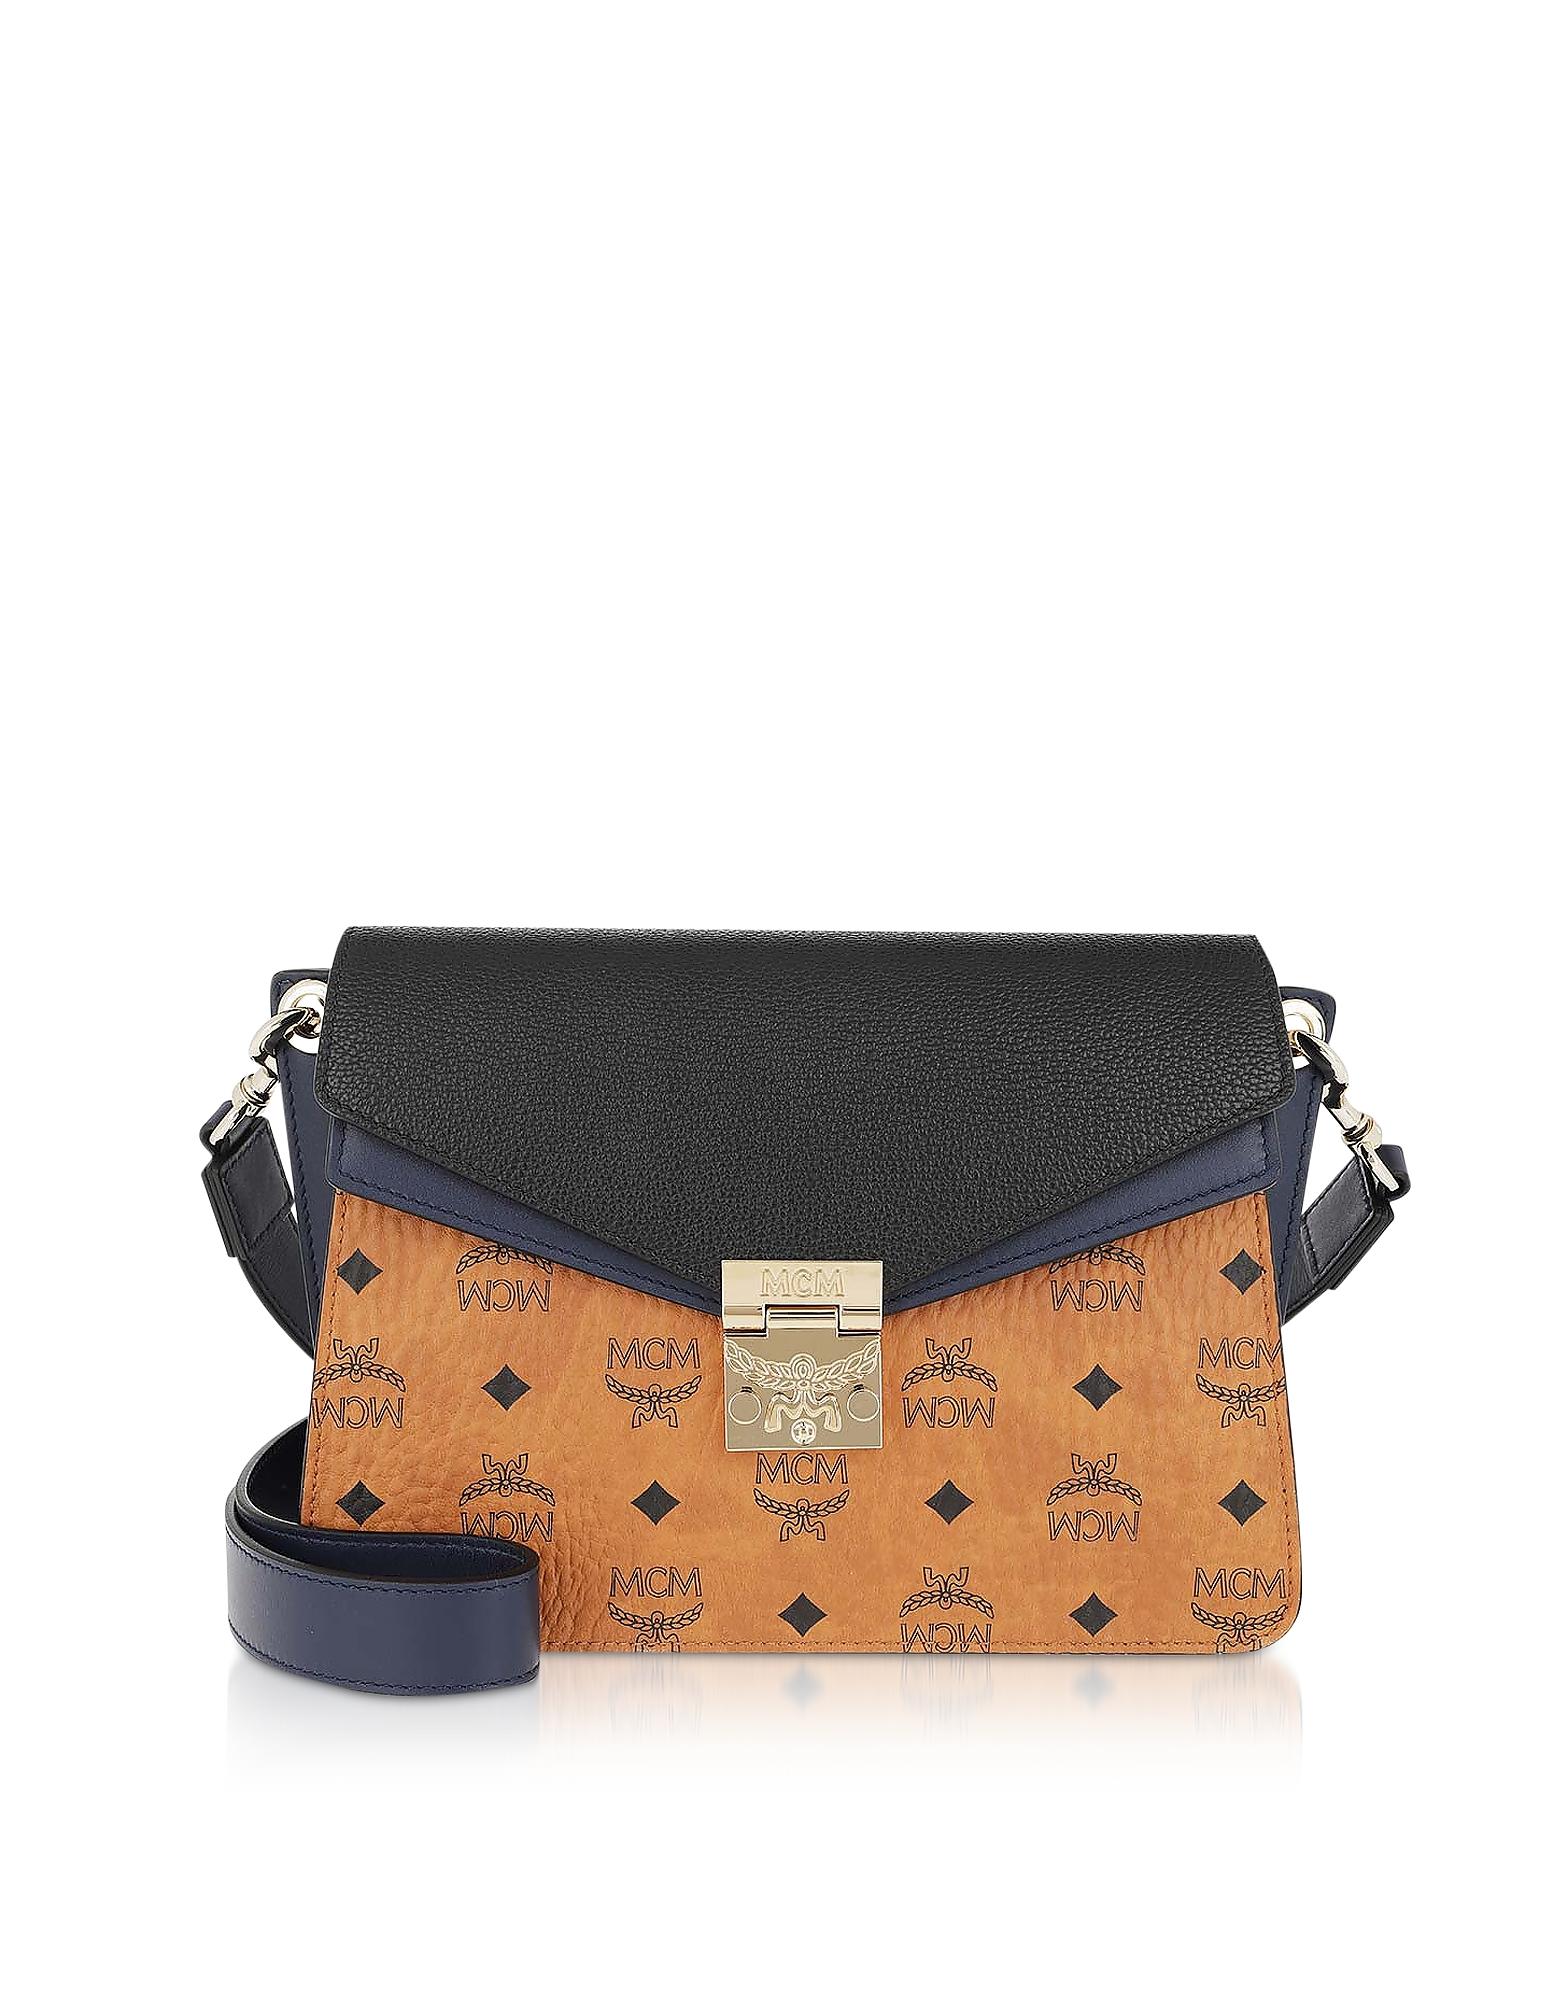 Patricia VIsetos Leather Block Small Satchel Bag